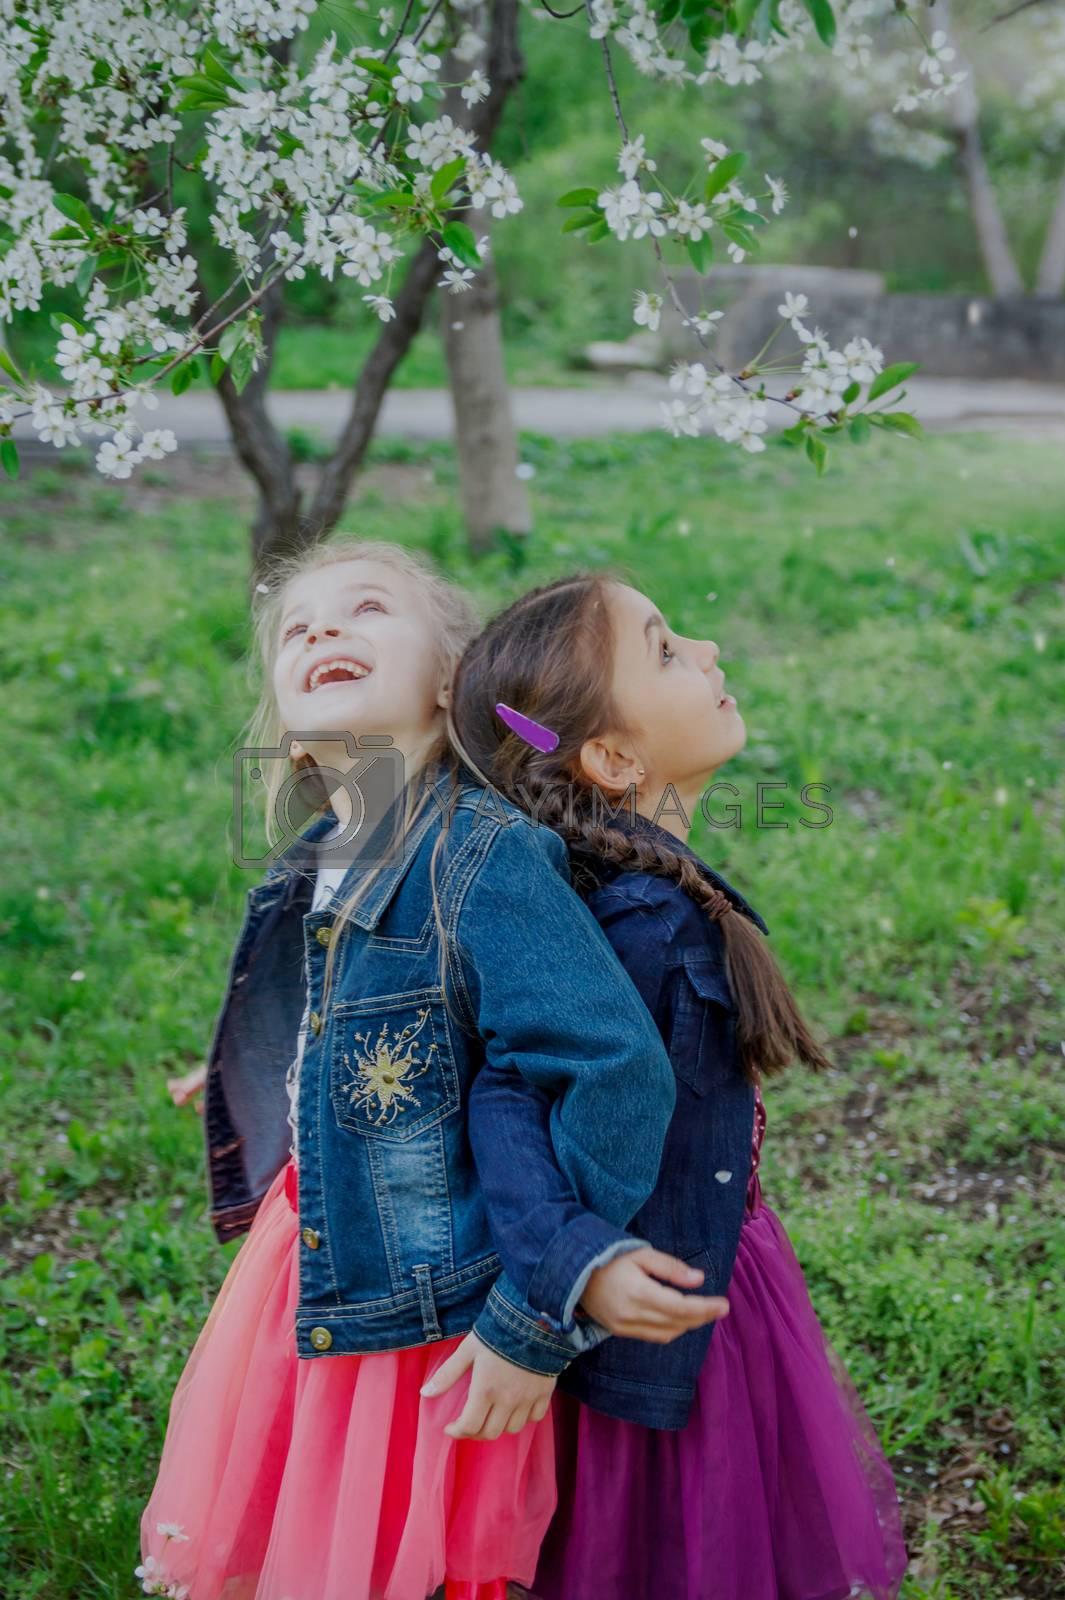 Two happy girls enjoying falling petals in spring garden